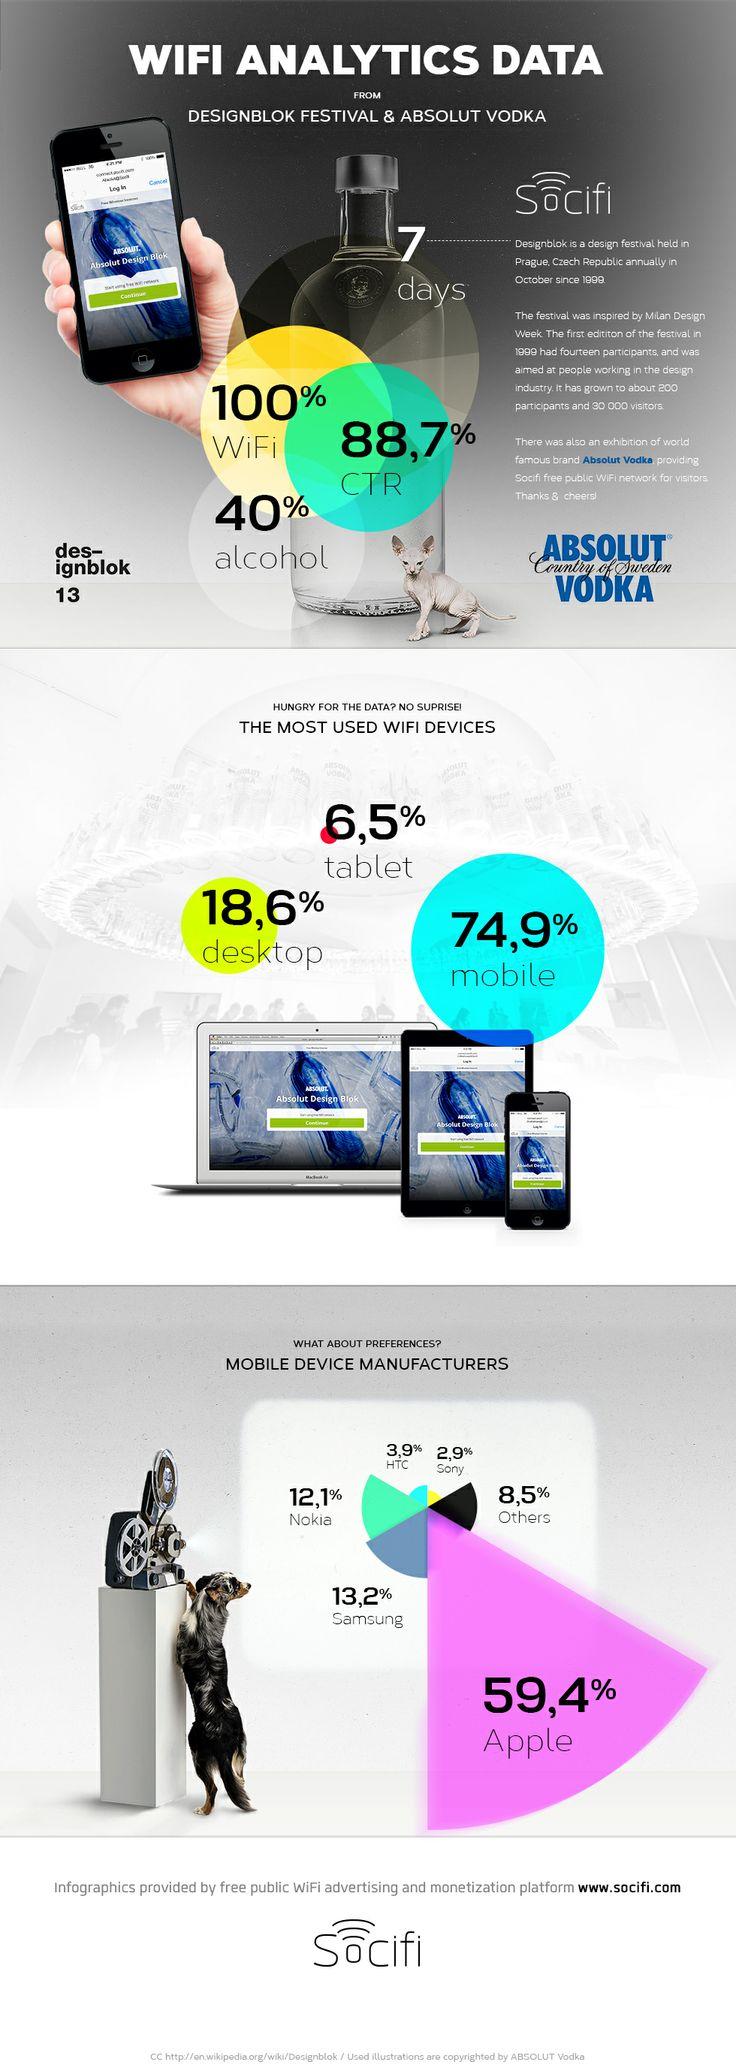 We love infographics. And Designblok & ABSOLUT Vodka too. www.socifi.com @Socifi